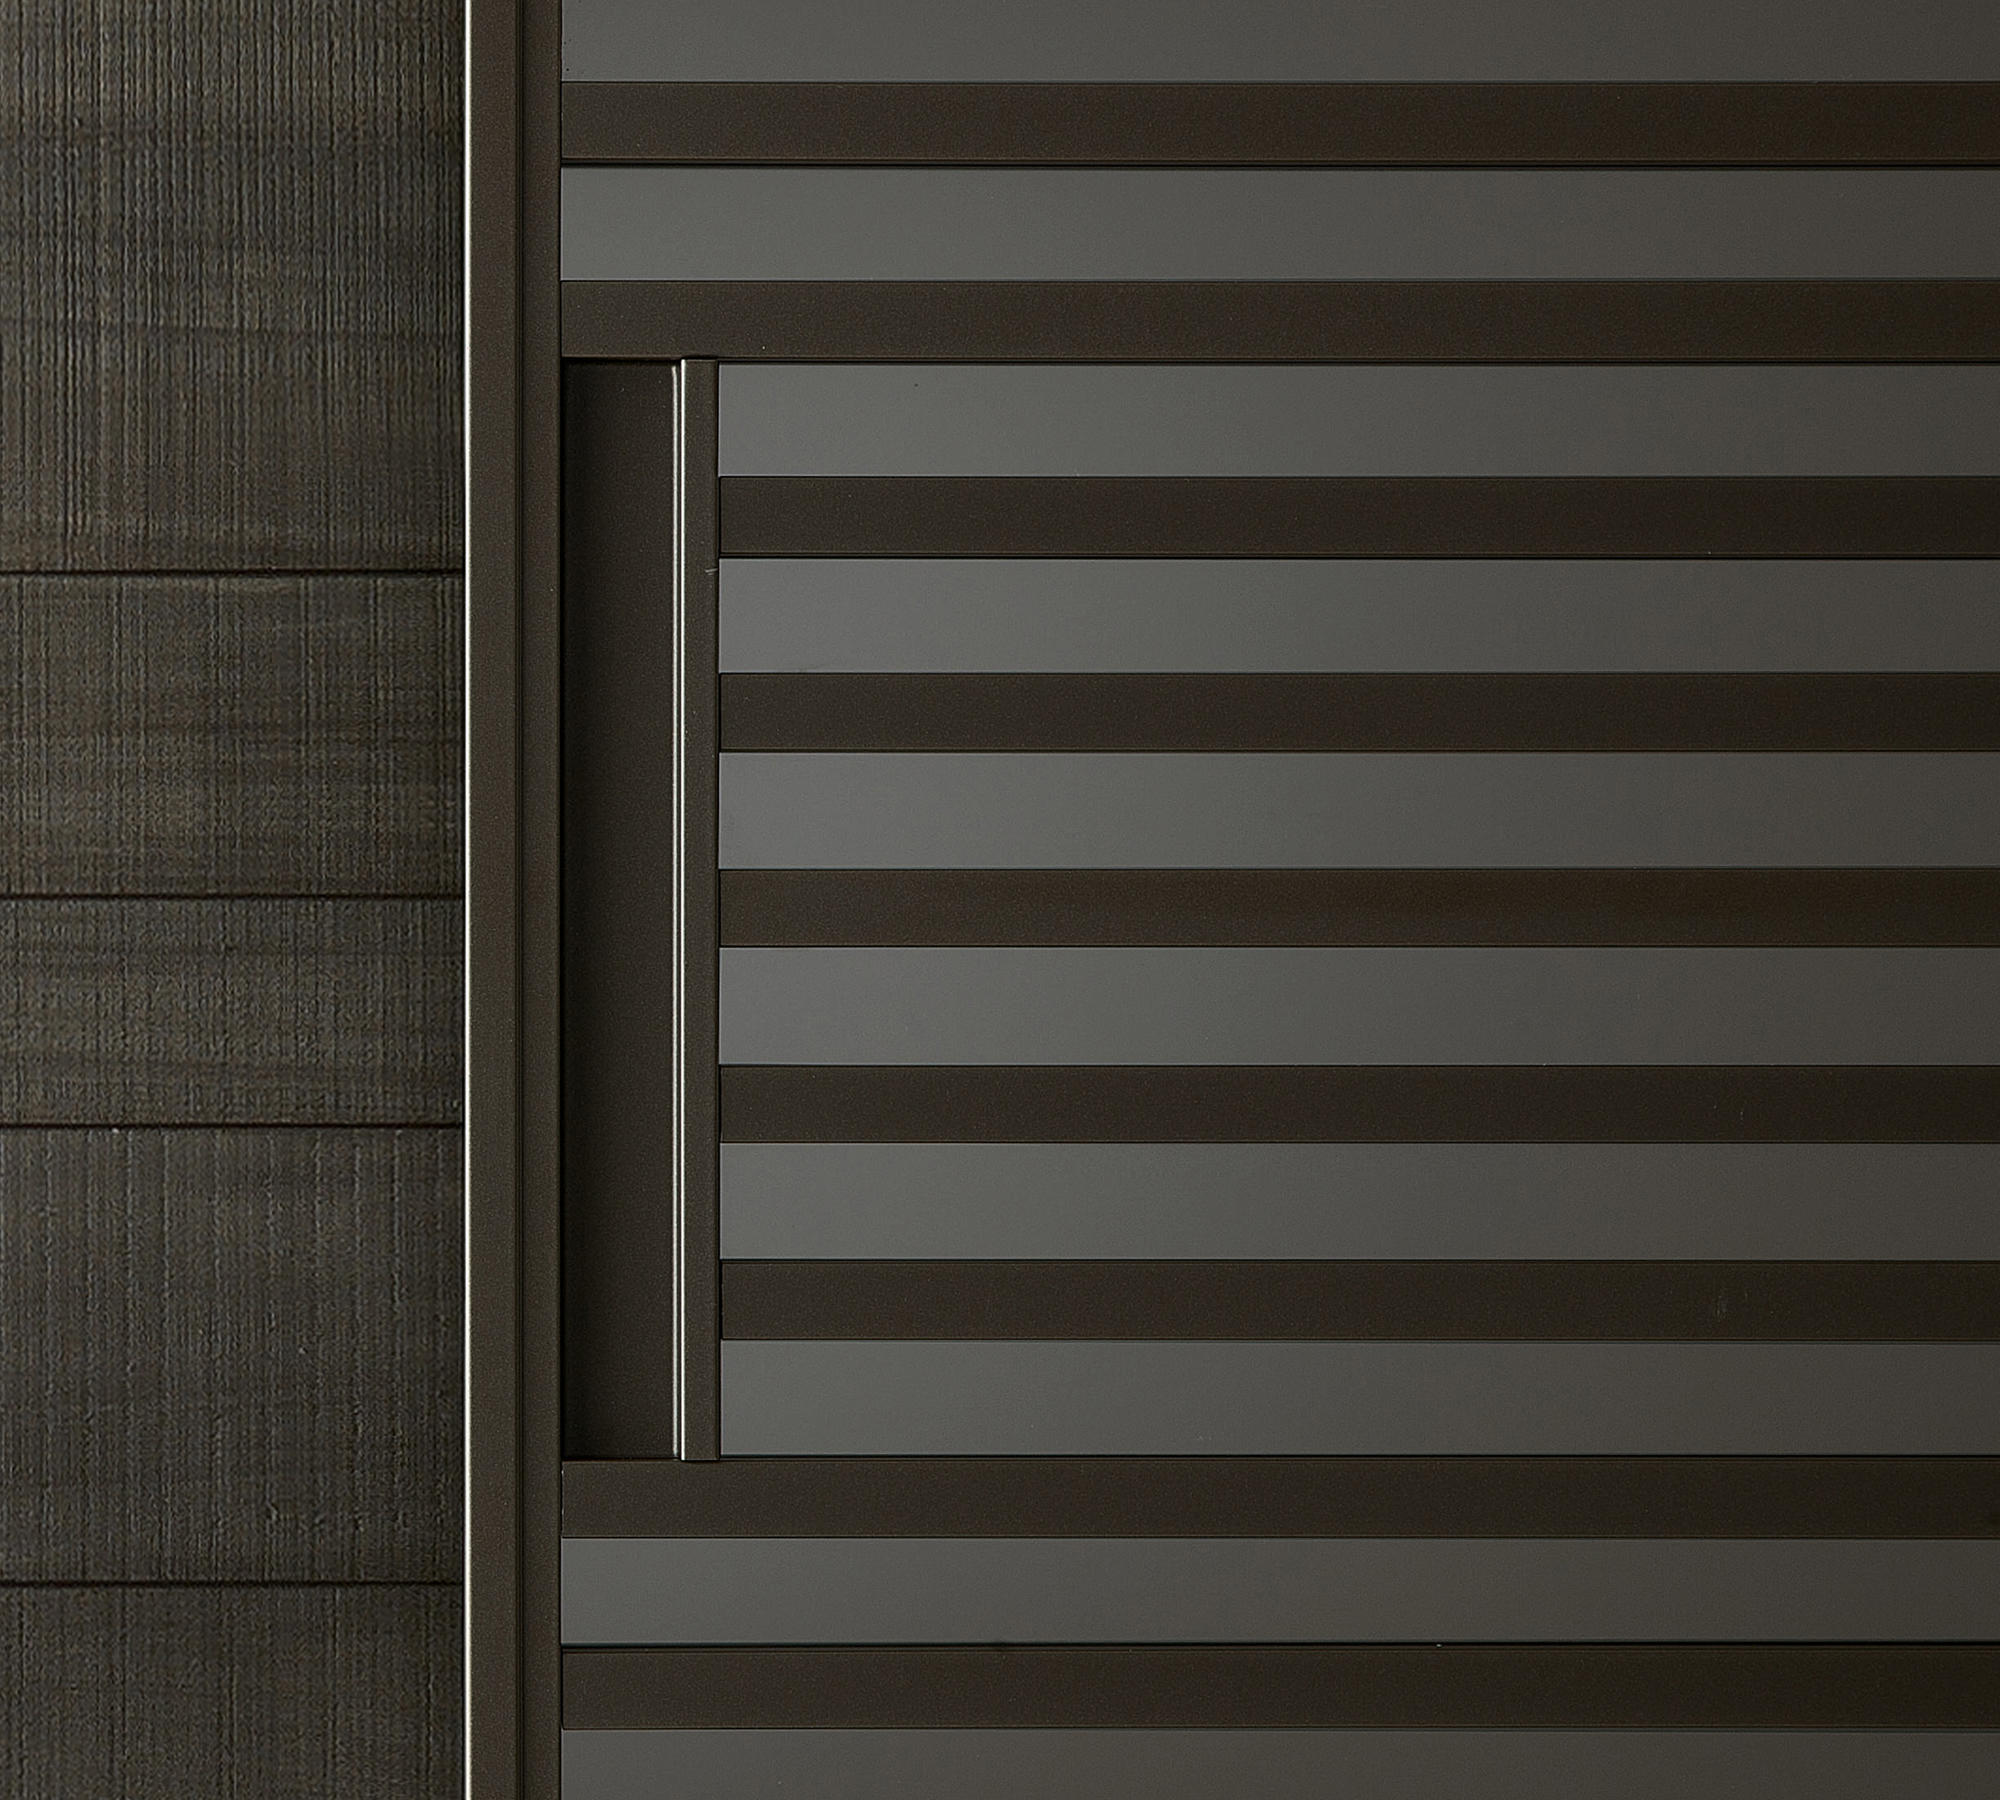 Porte Scorrevoli Rimadesio Outlet.Door Rimadesio Rimadesio Siparium Folding Doors Hobsons Choice